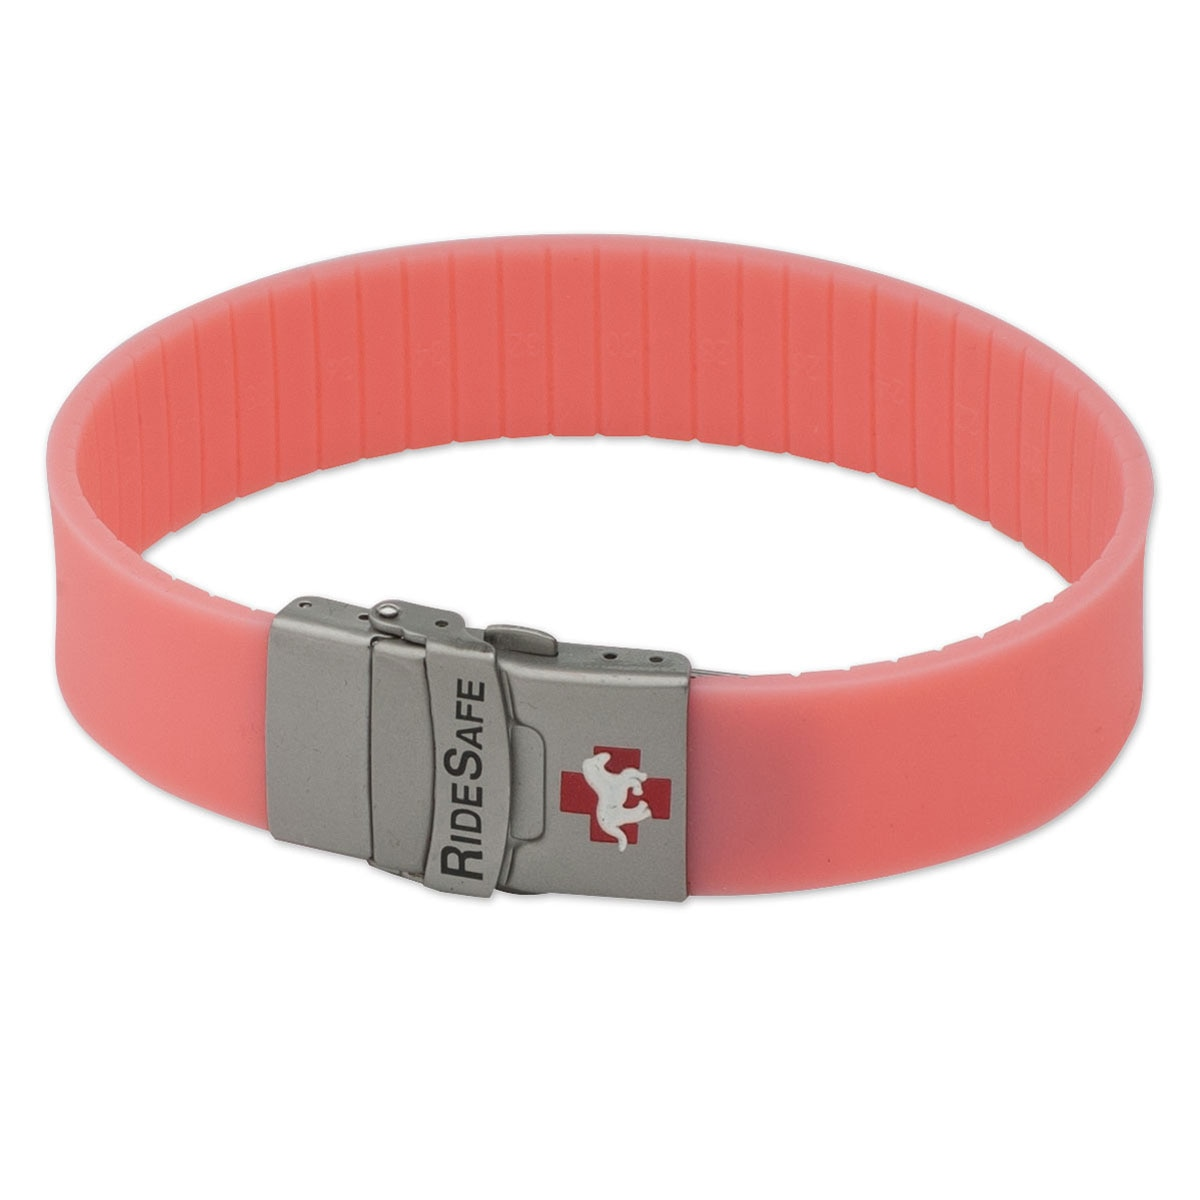 Ride Safe Bracelet